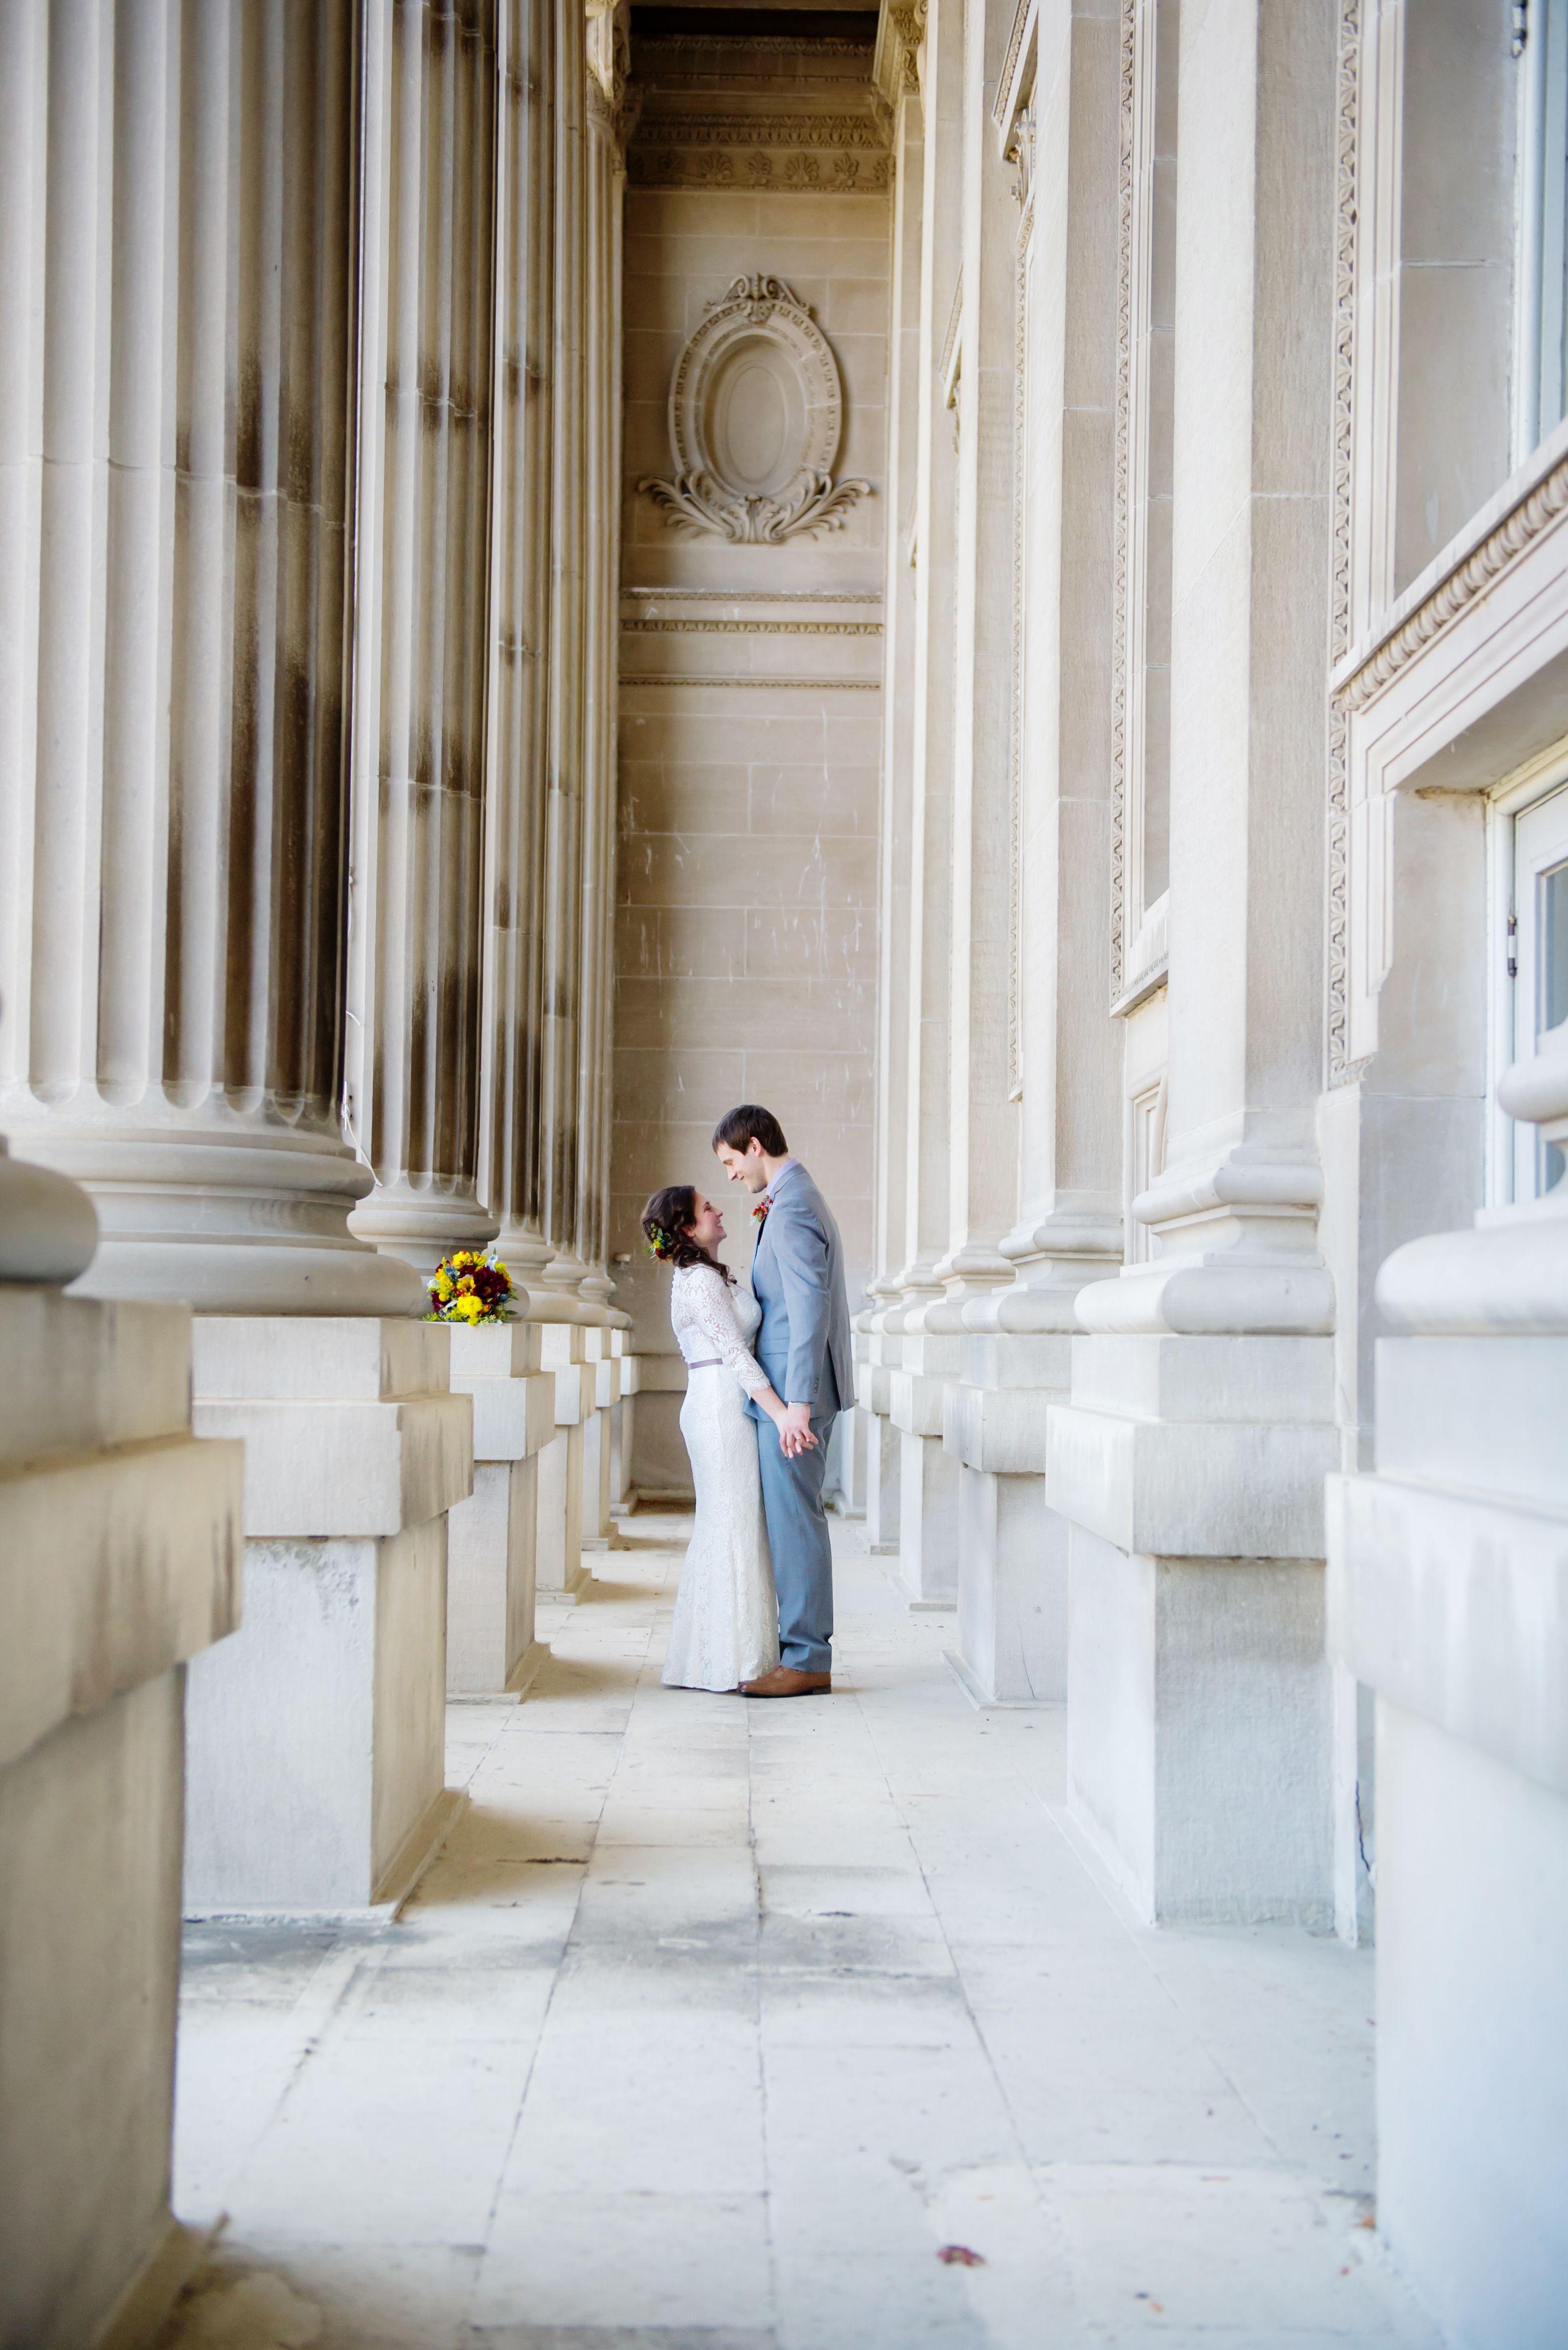 Wisconsin Historical Society Wedding Reception Venue Historic